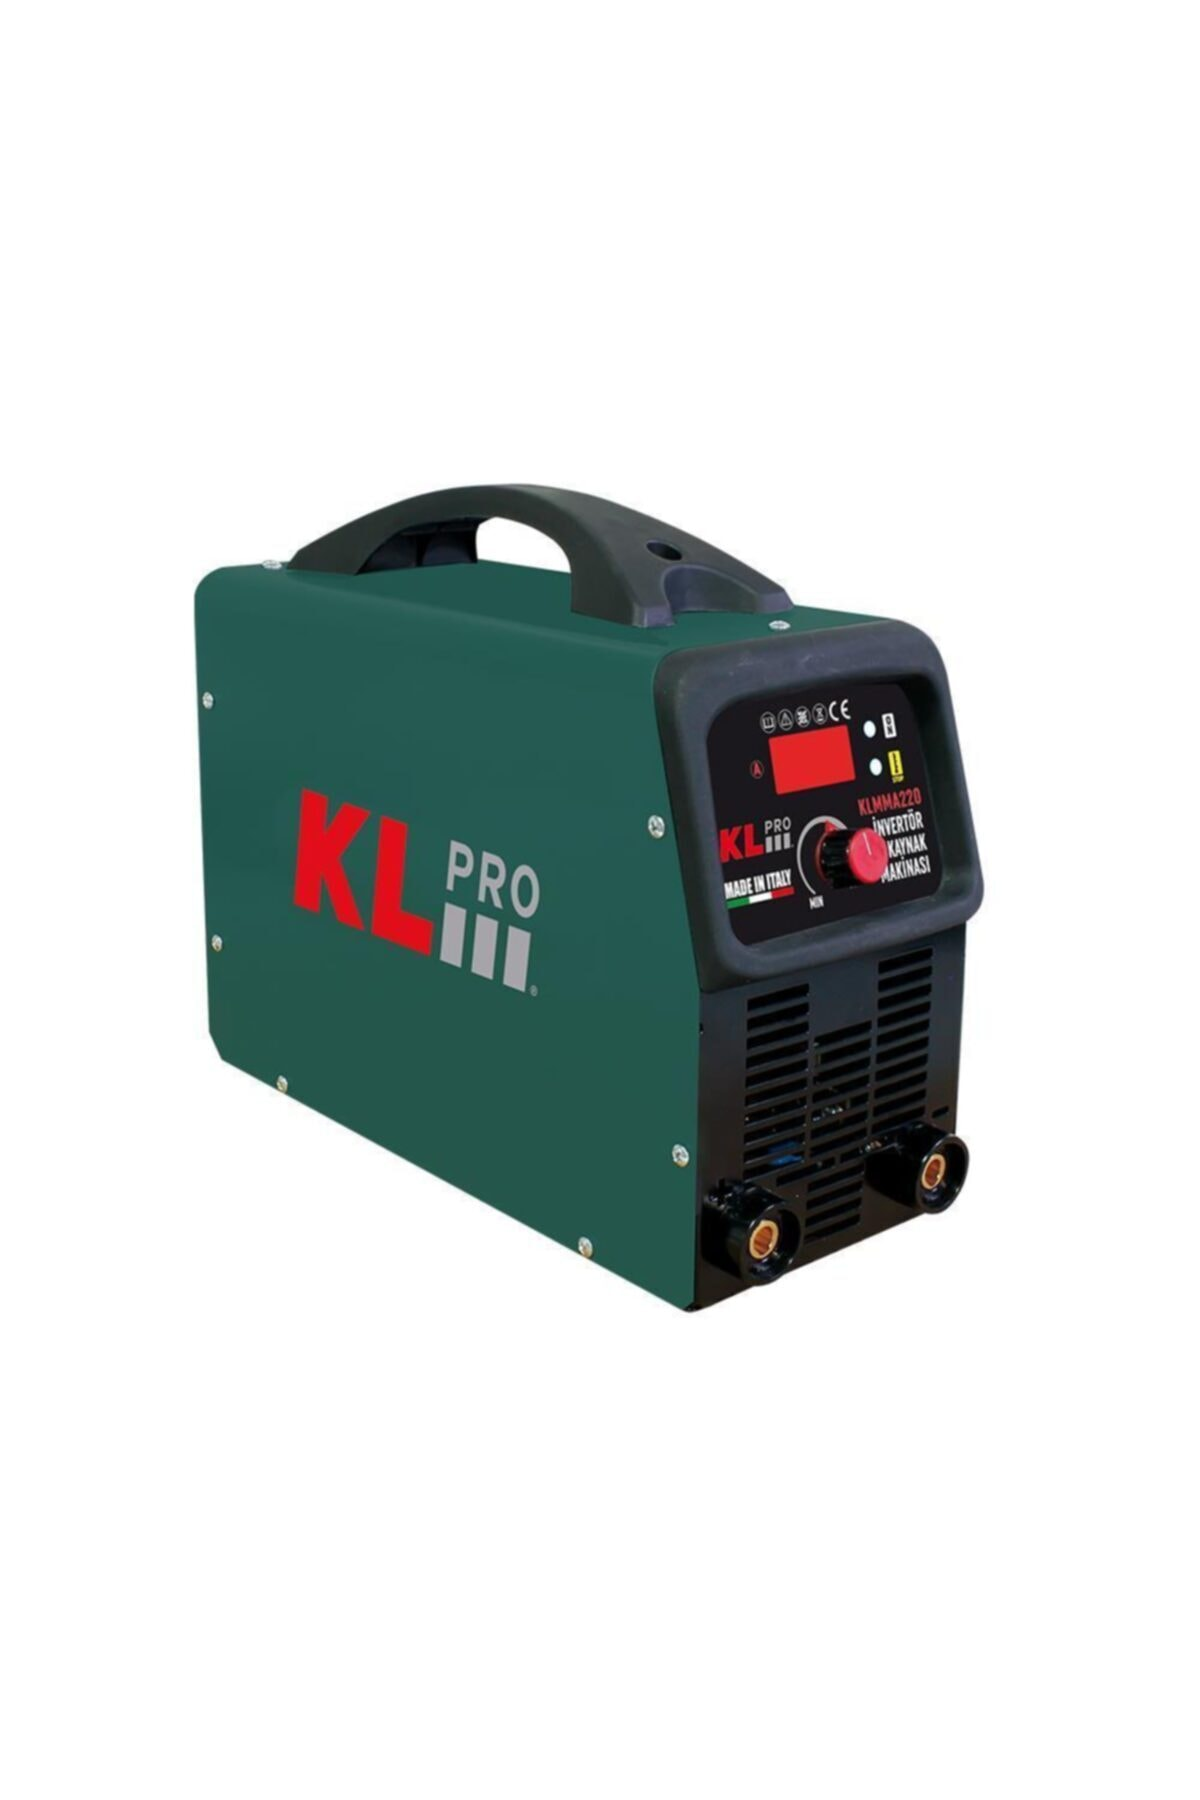 KLPRO 220 Amper Inverter Kaynak Makinesi Klmma220 1